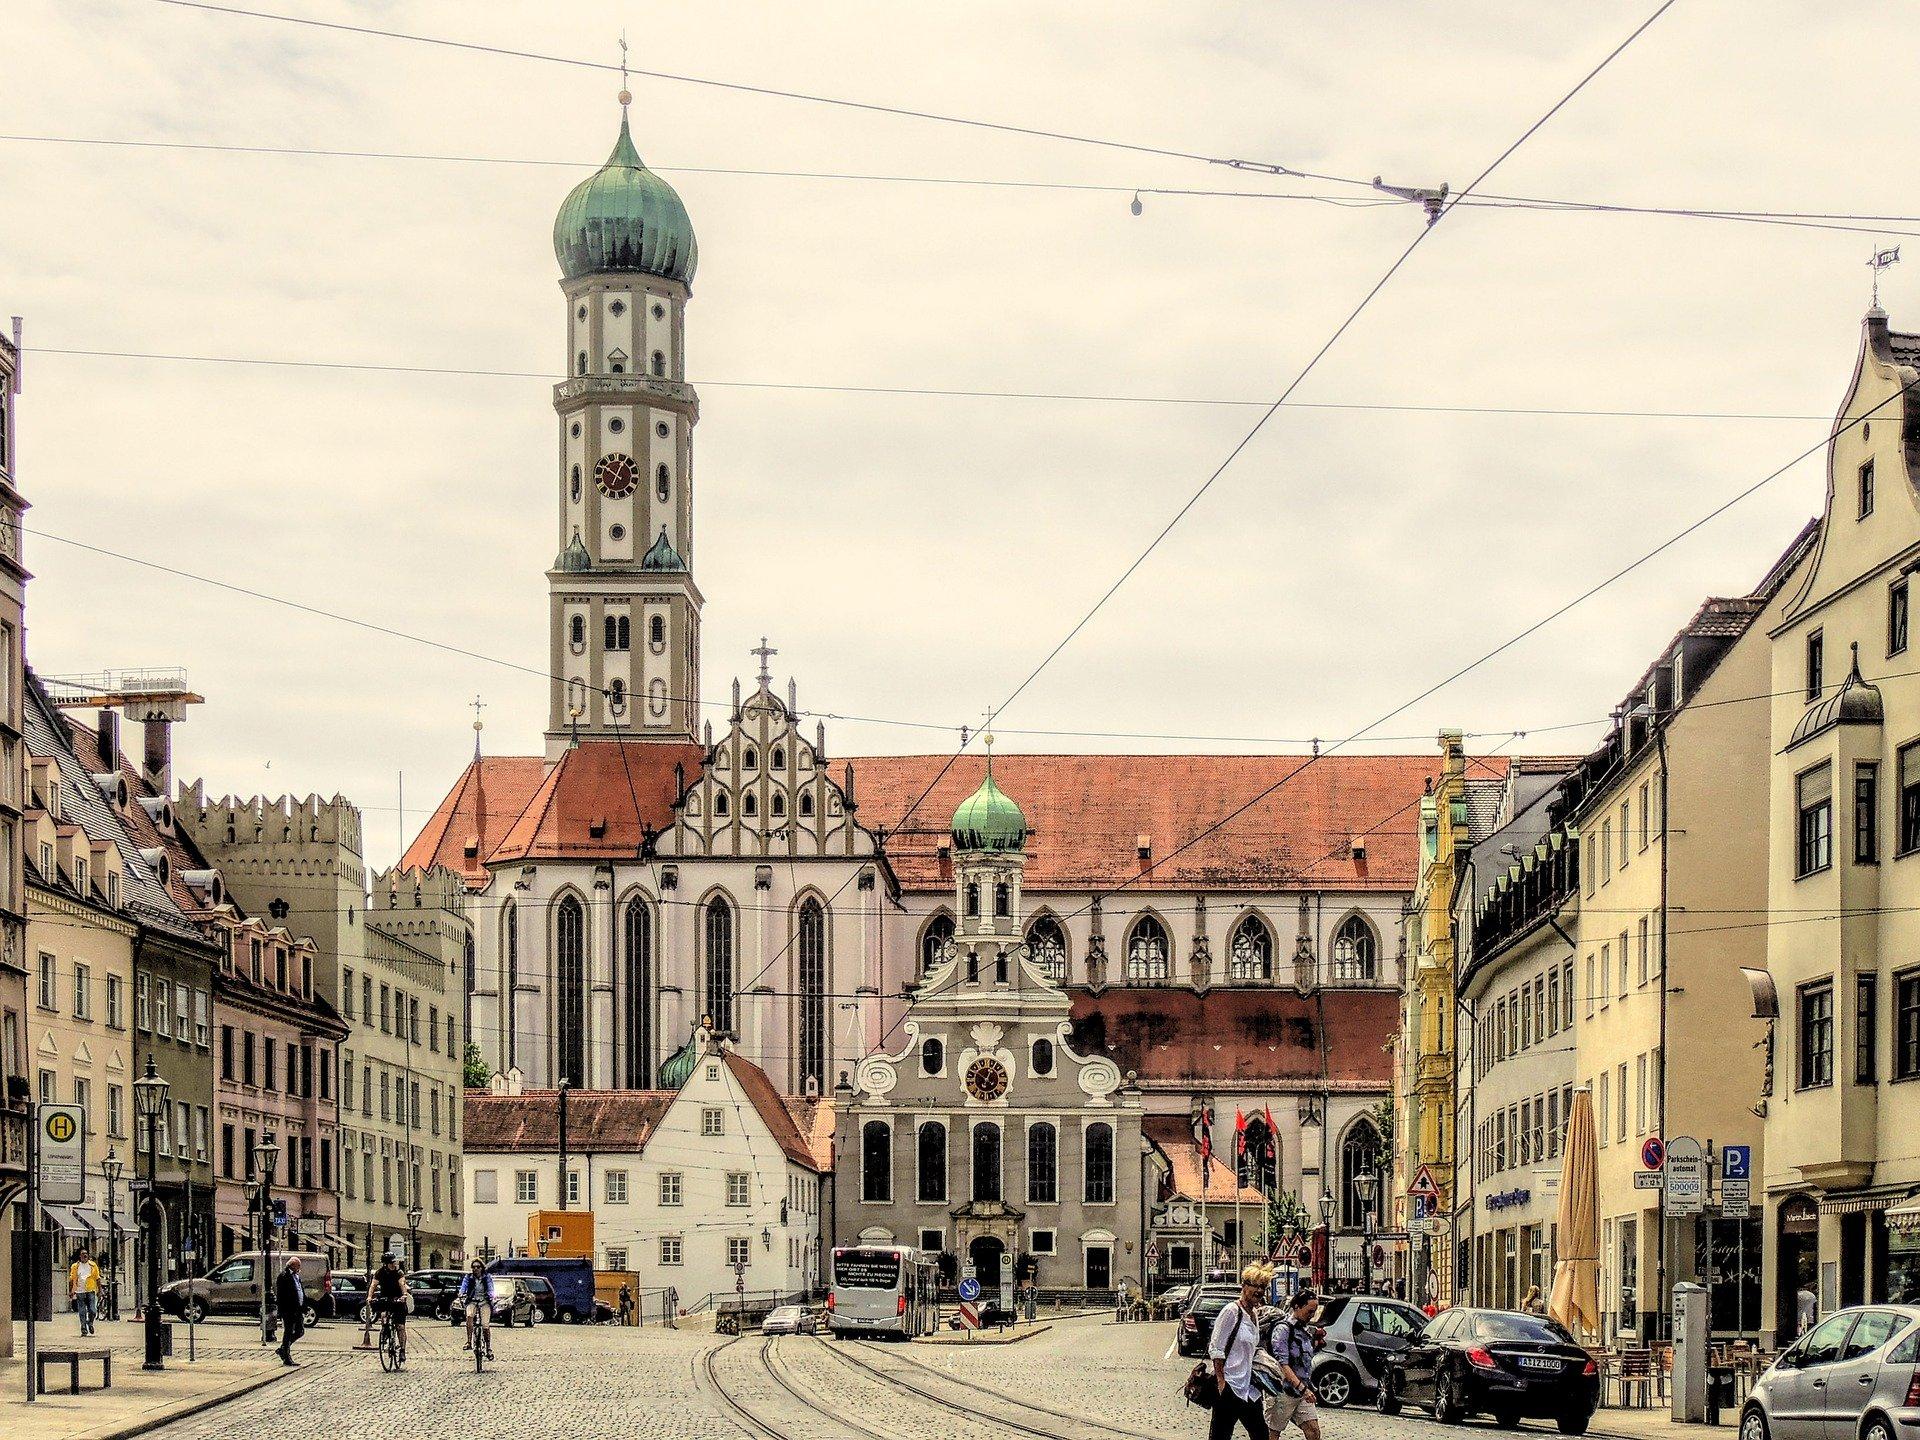 Blick in die Altstadt von Augsburg